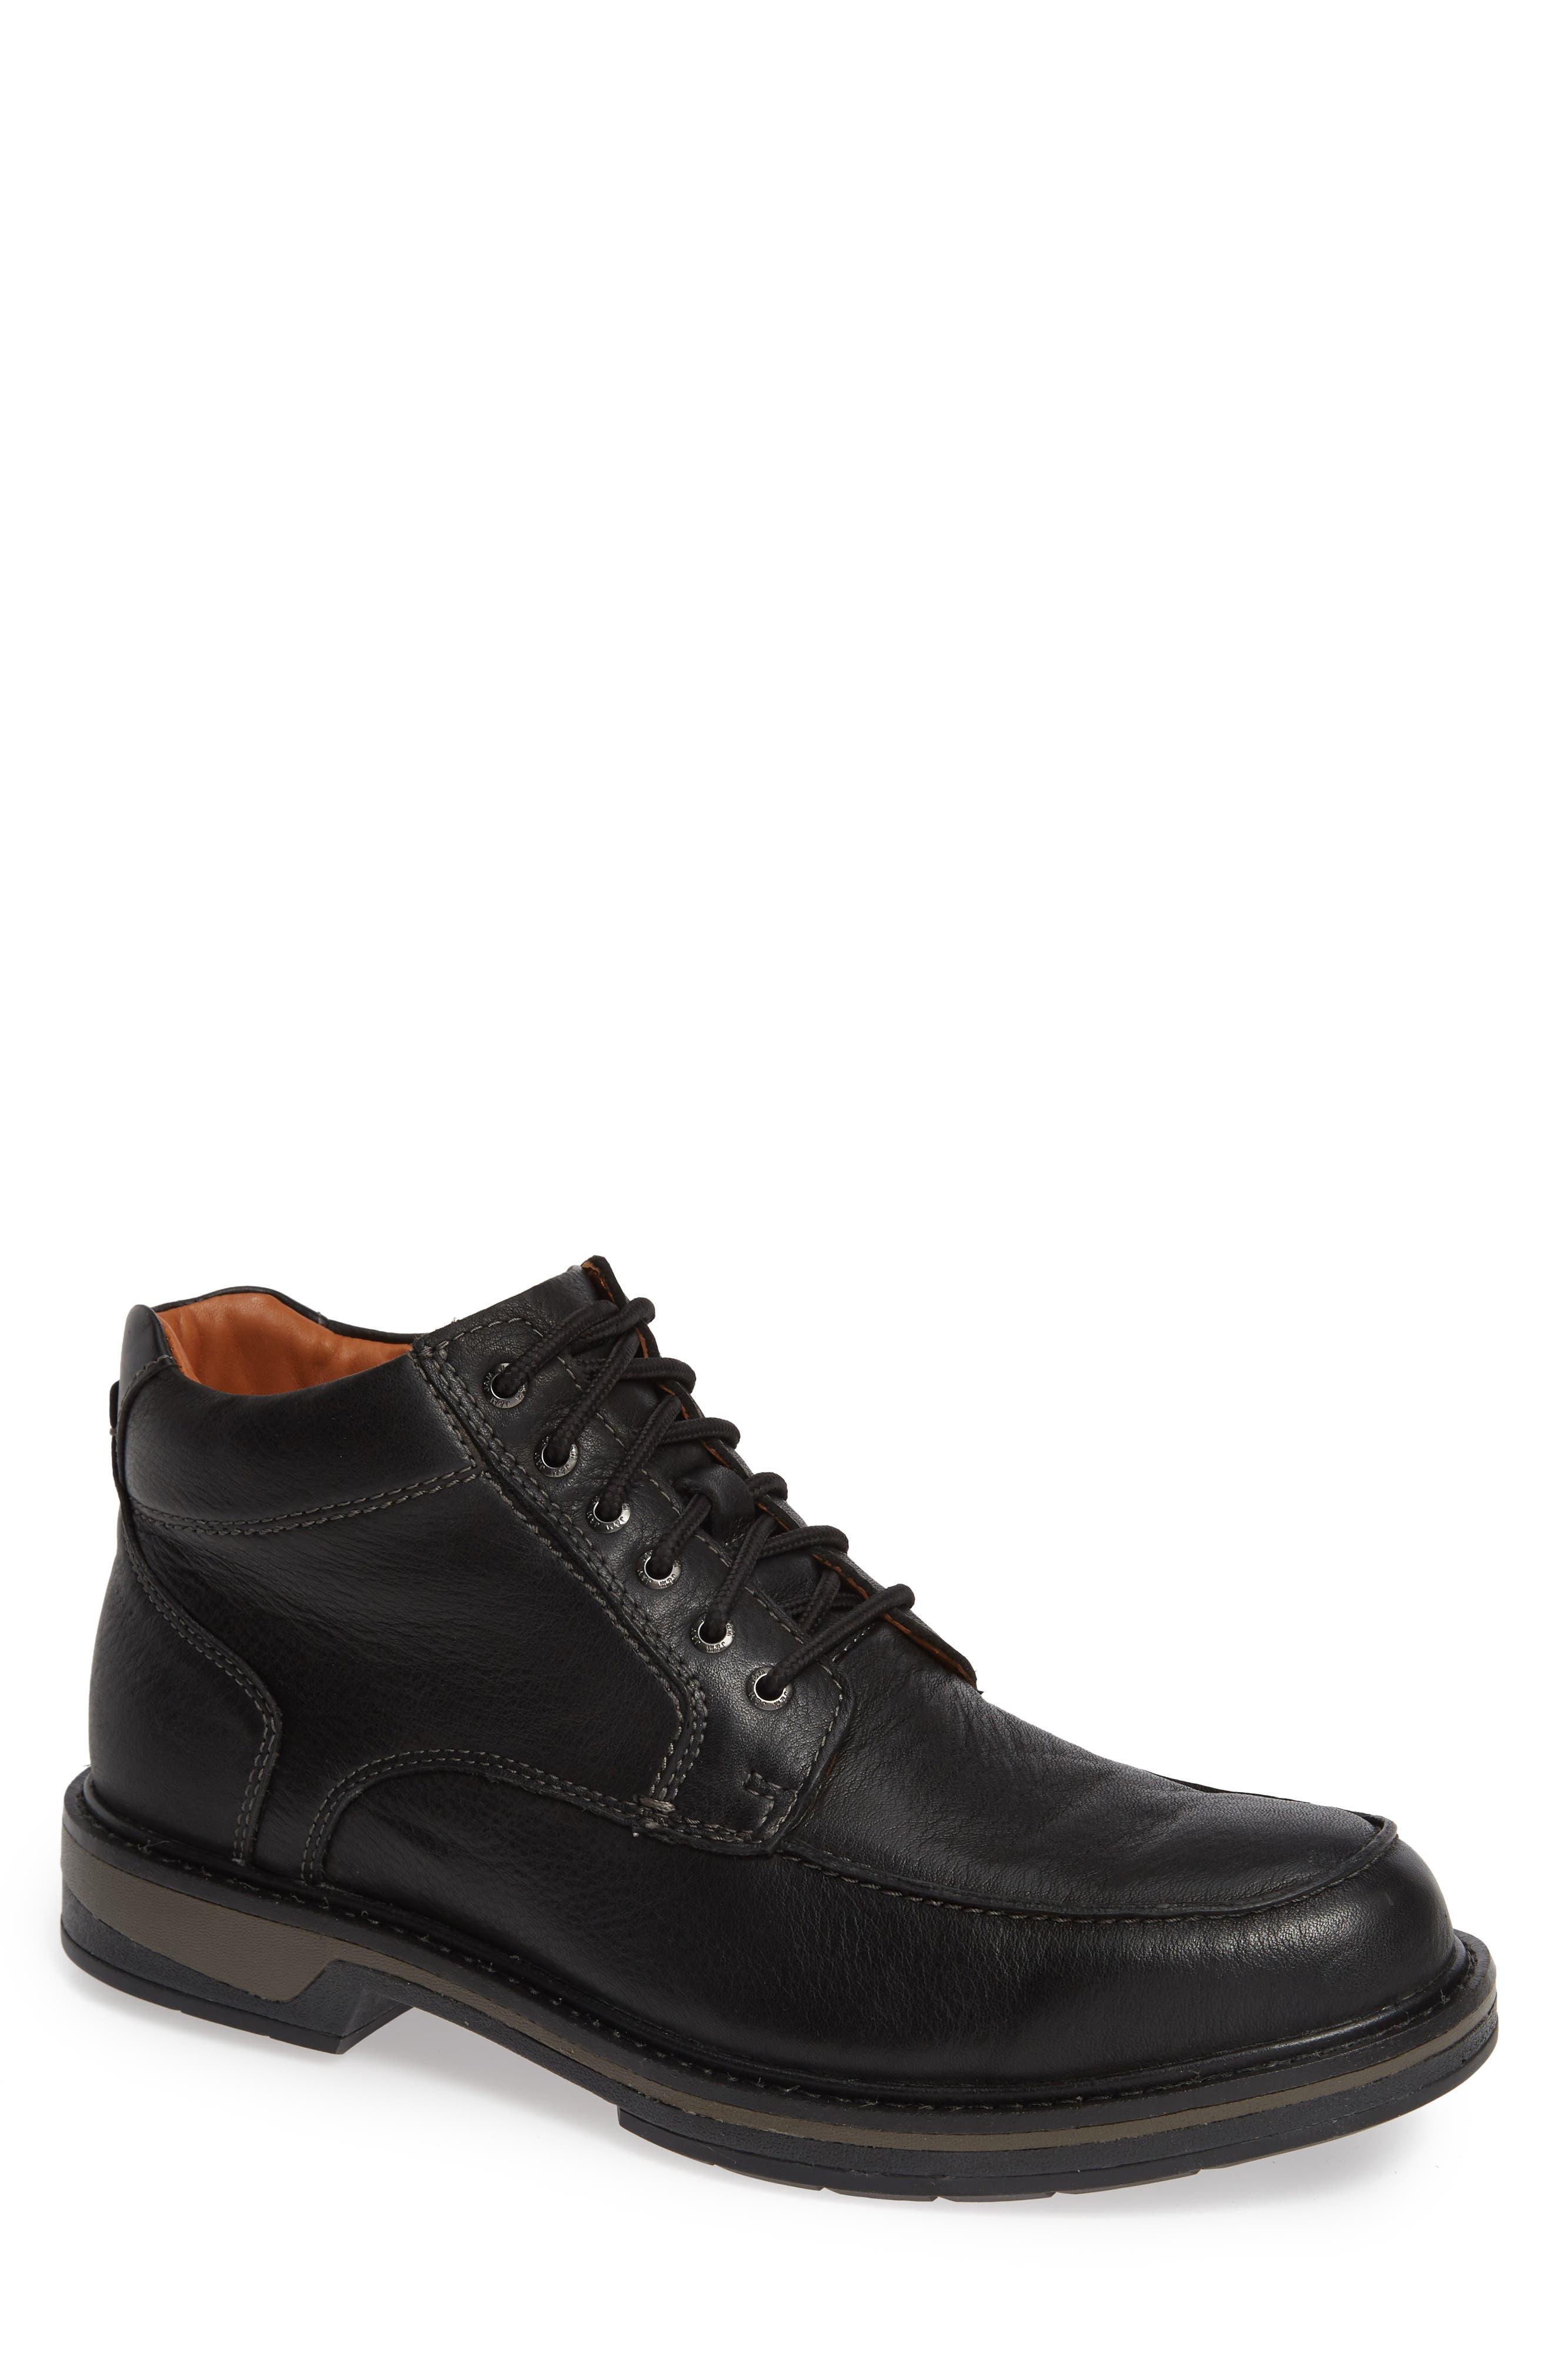 Rutledge Waterproof Moc Toe Boot,                             Main thumbnail 1, color,                             BLACK LEATHER